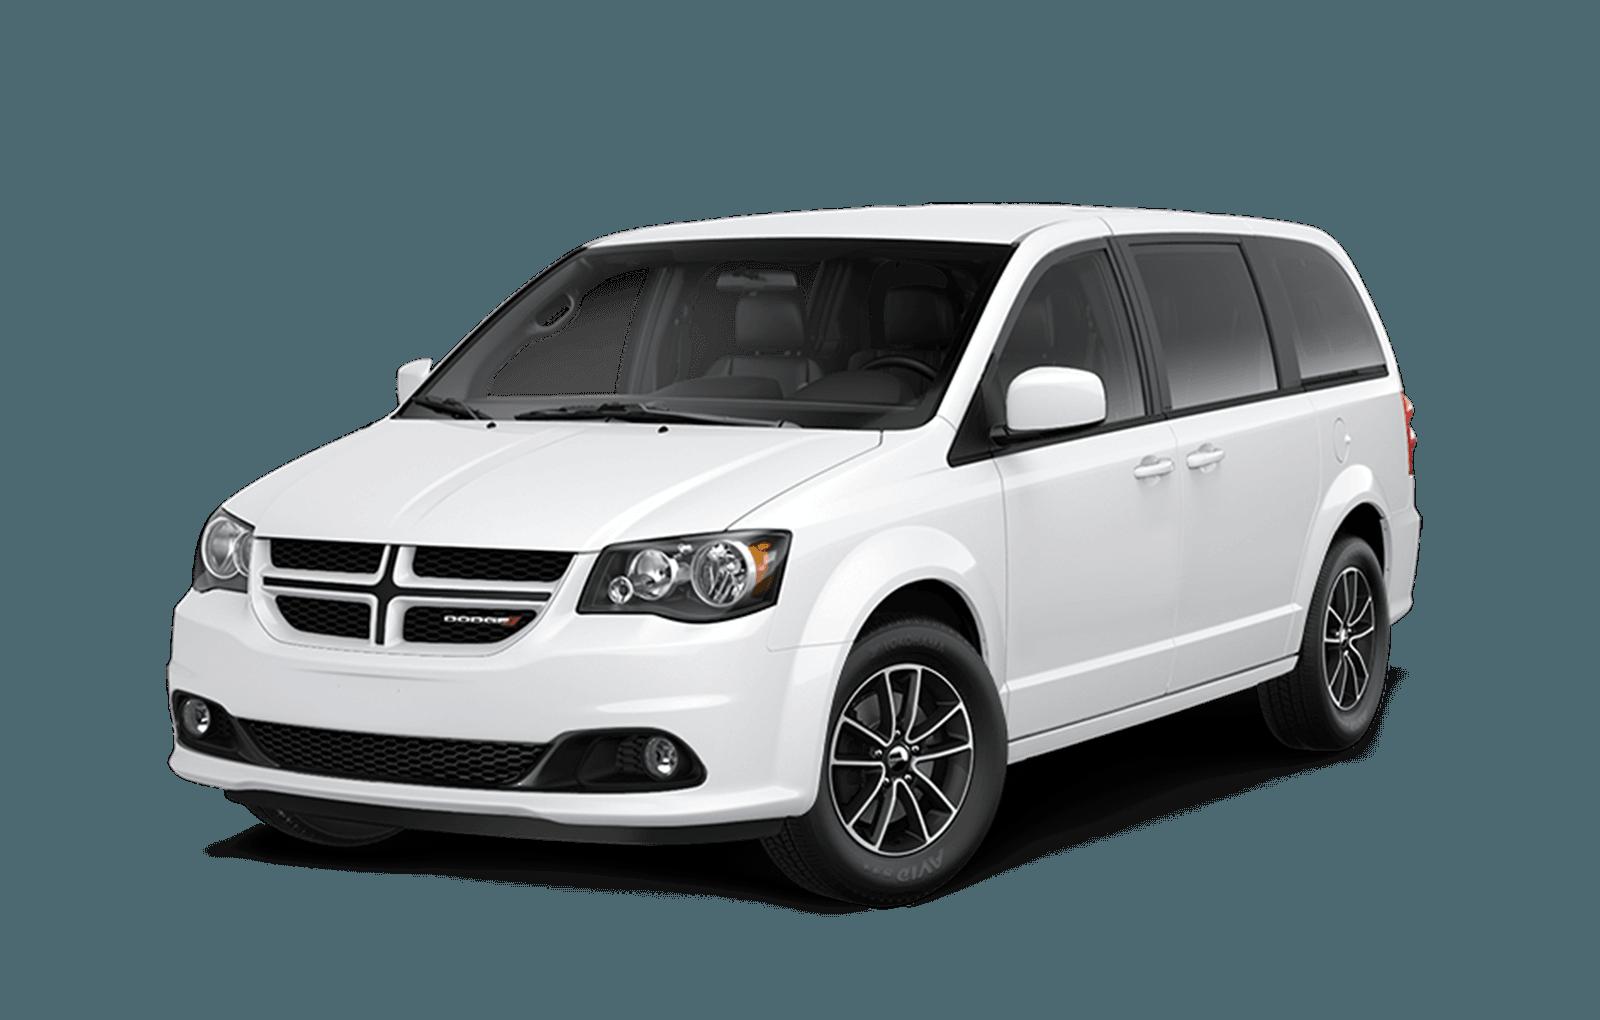 2019 Dodge Grand Caravan | Dodge Canada